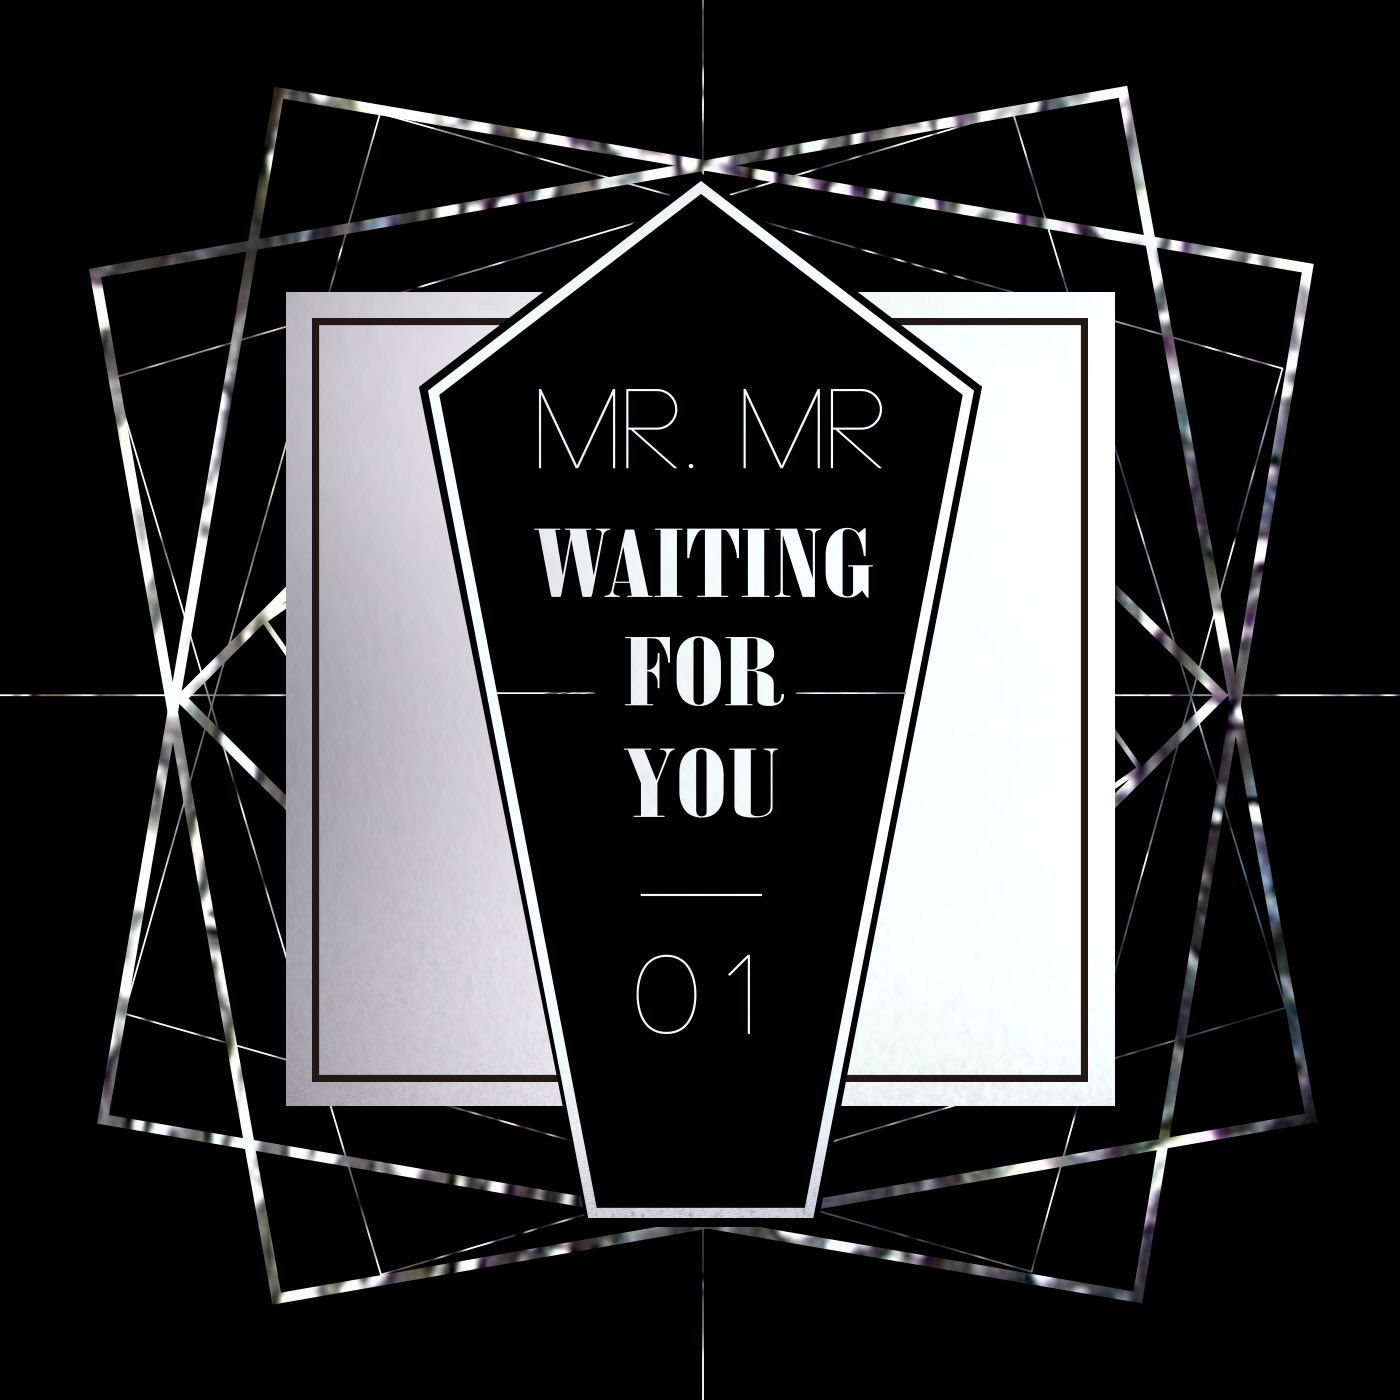 [Mini Album] Mr.Mr - Waiting for You [1st Mini Album]